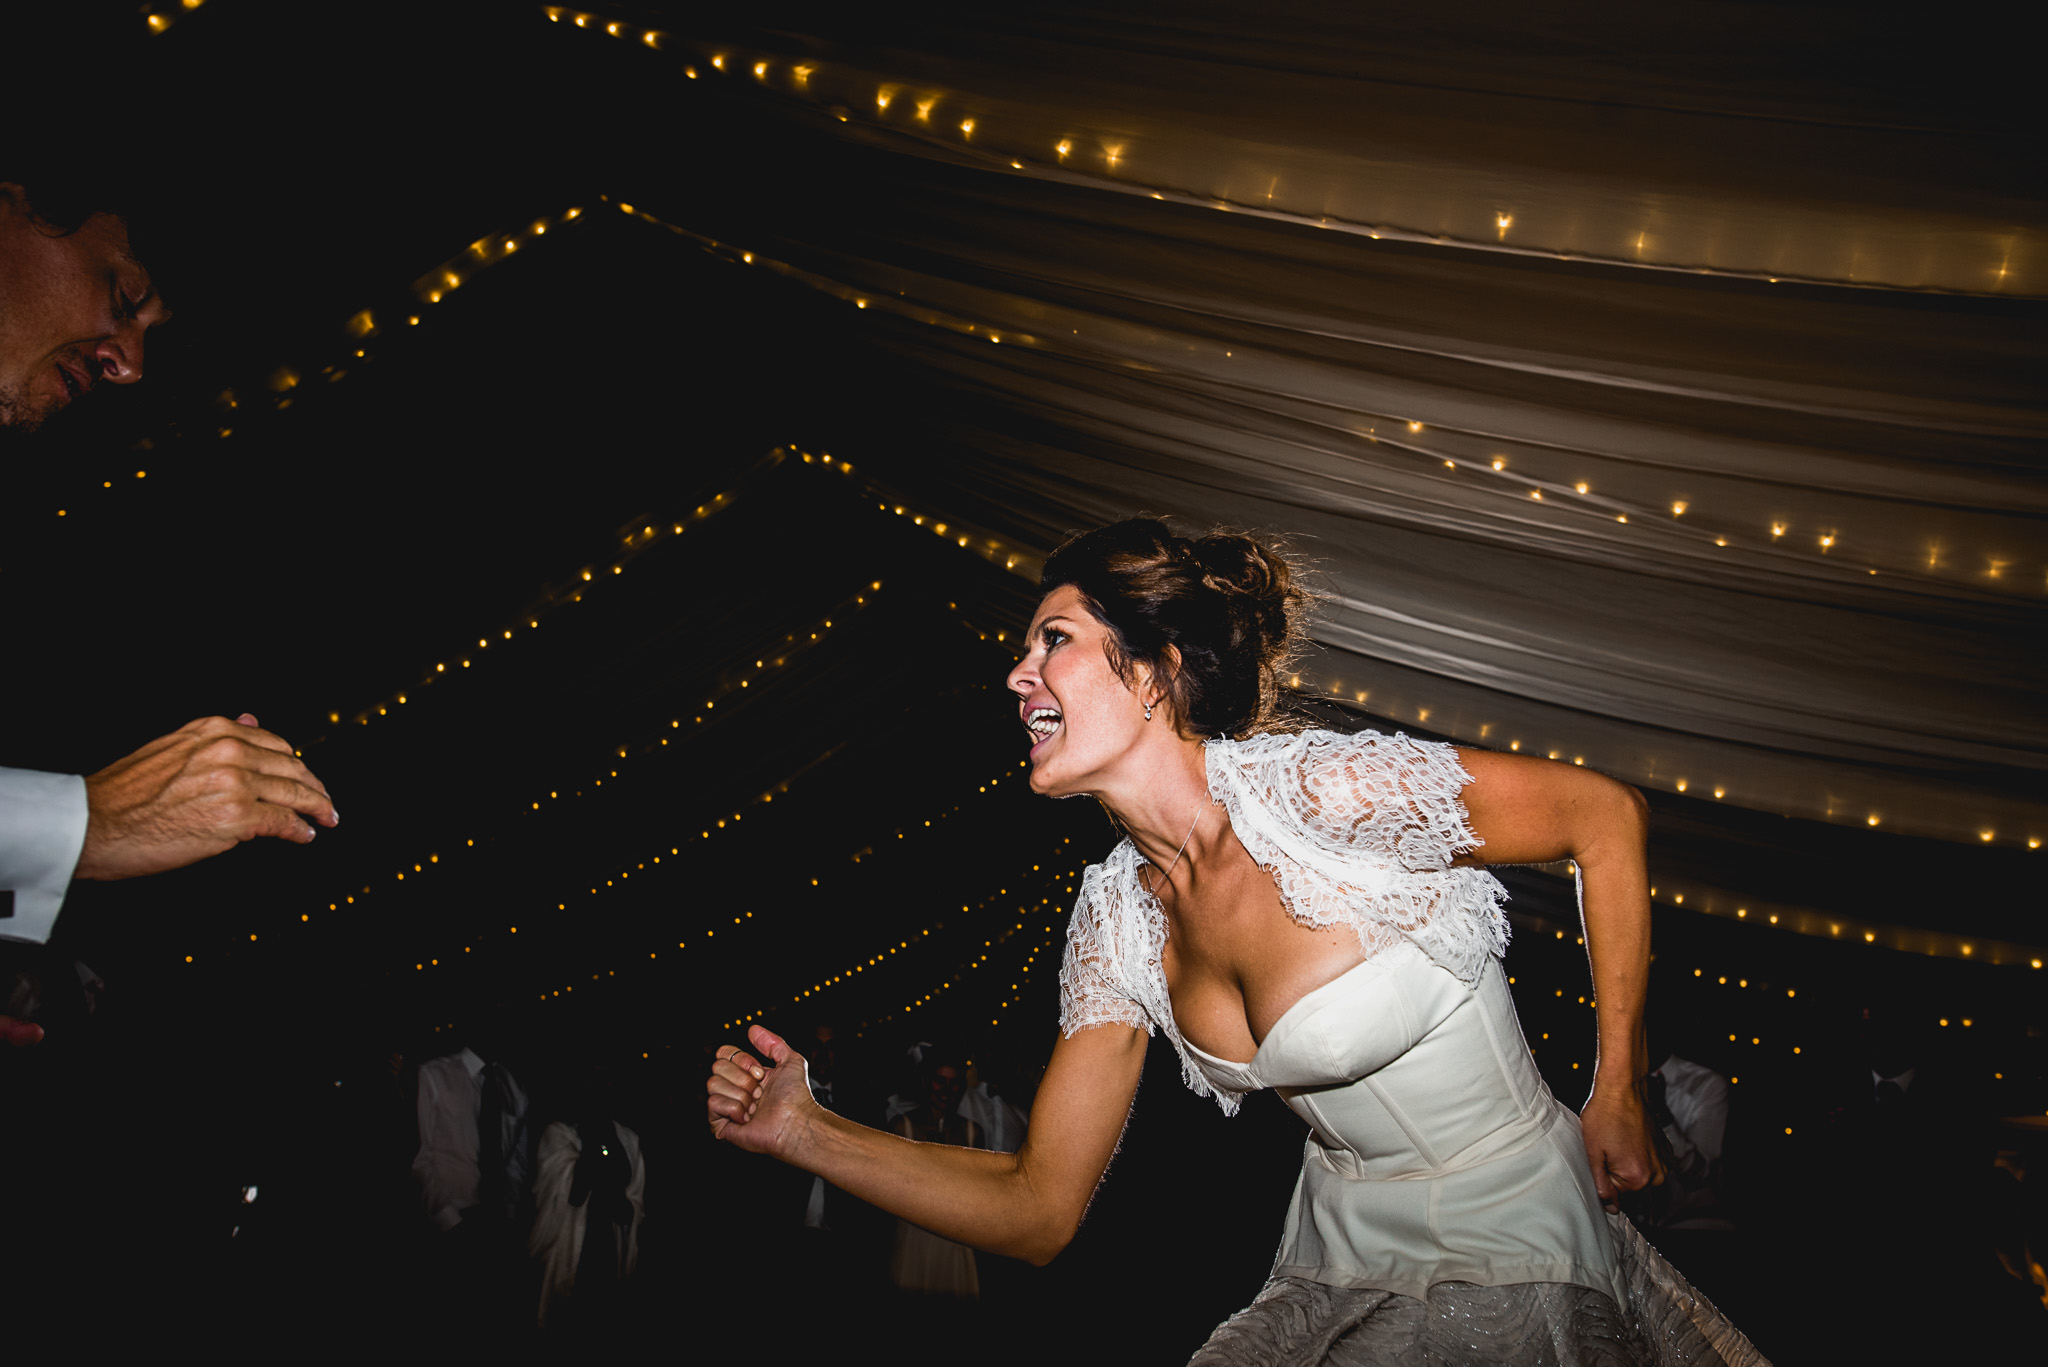 Lara & Jack Wedding 220815 by Barney Walters_1053_BW2_1041